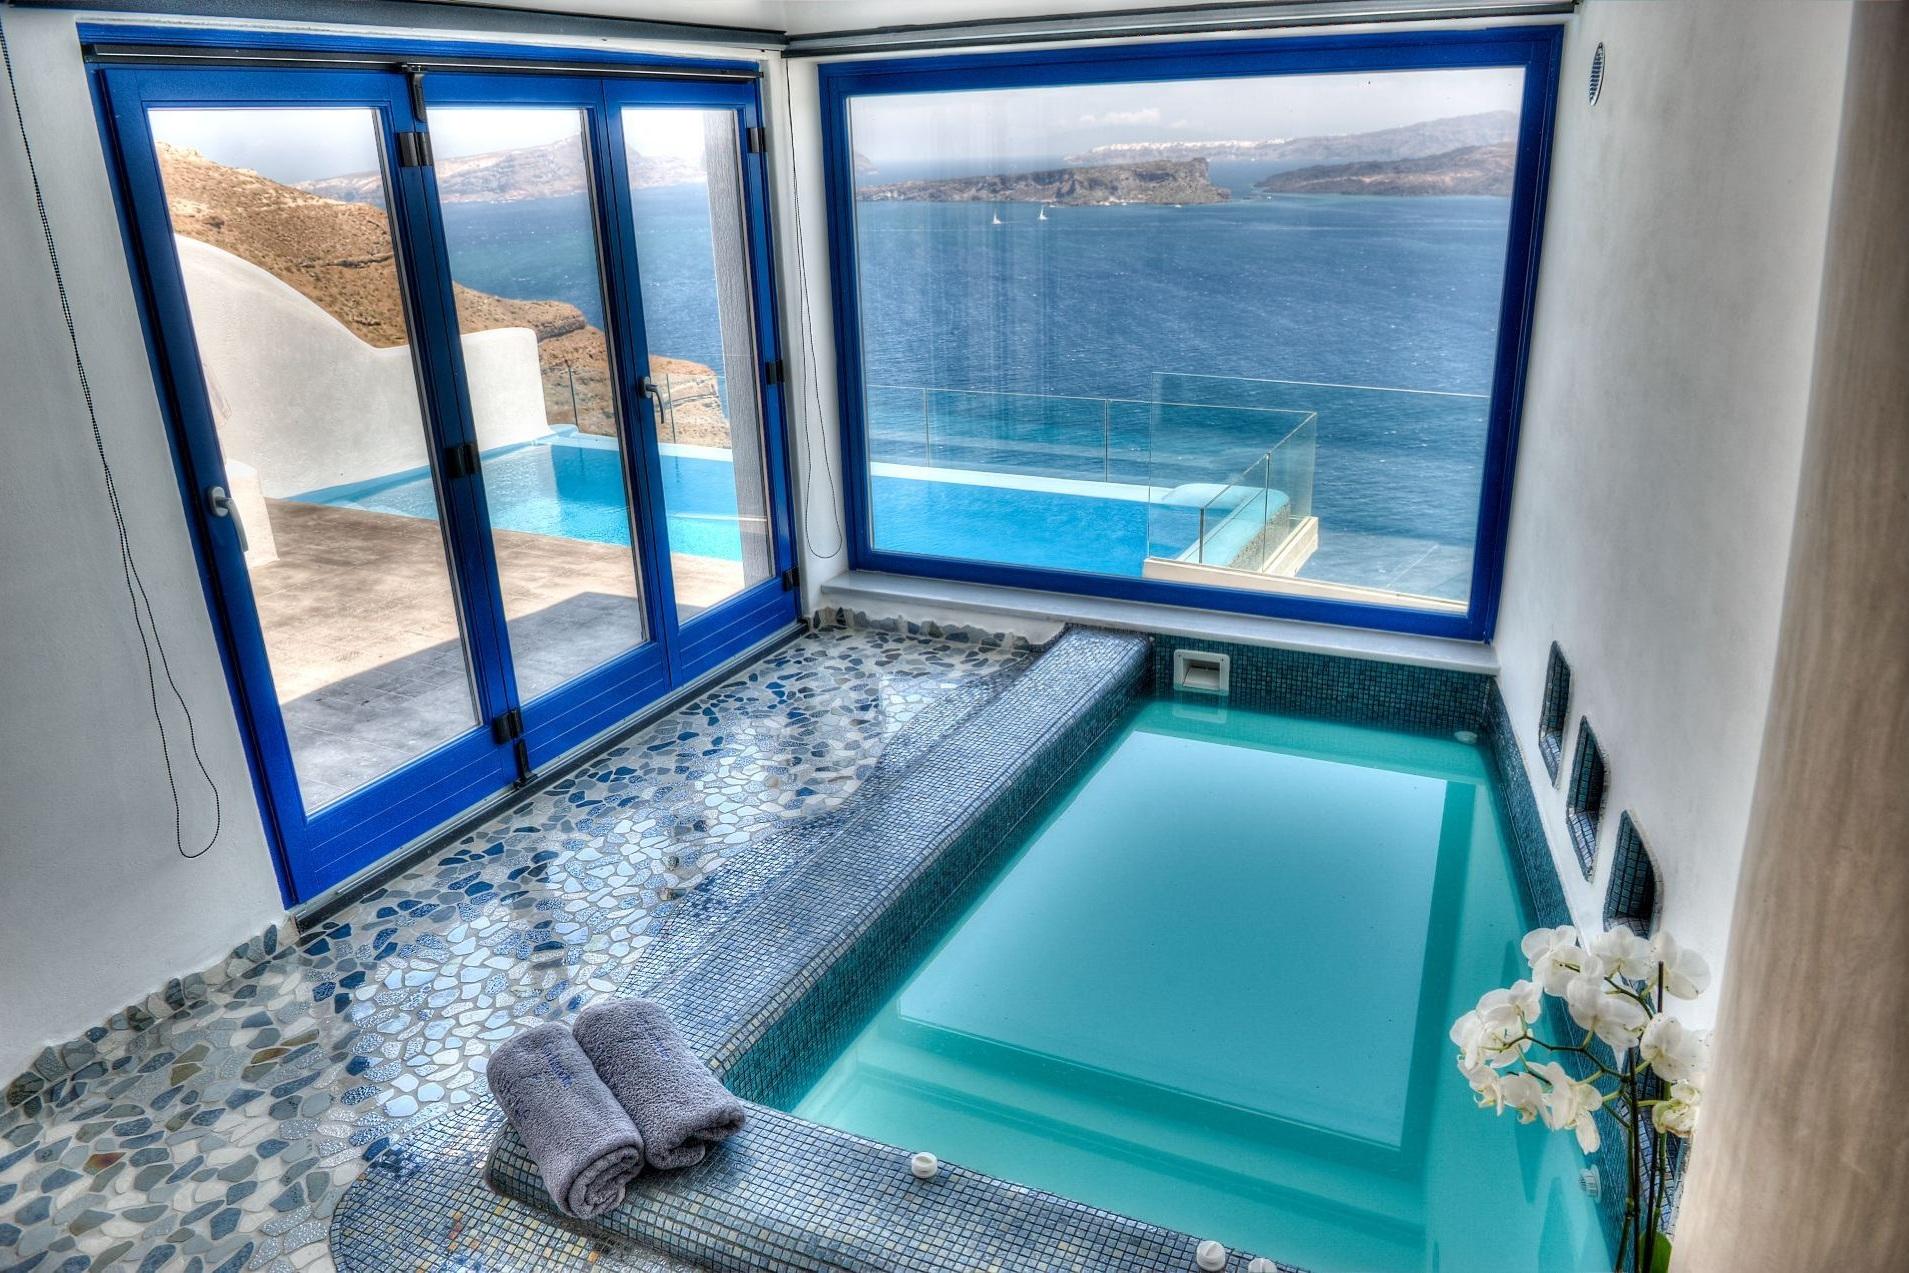 Astarte_Suite_private_infinity_pool_Santorini_A5_-_.jpg